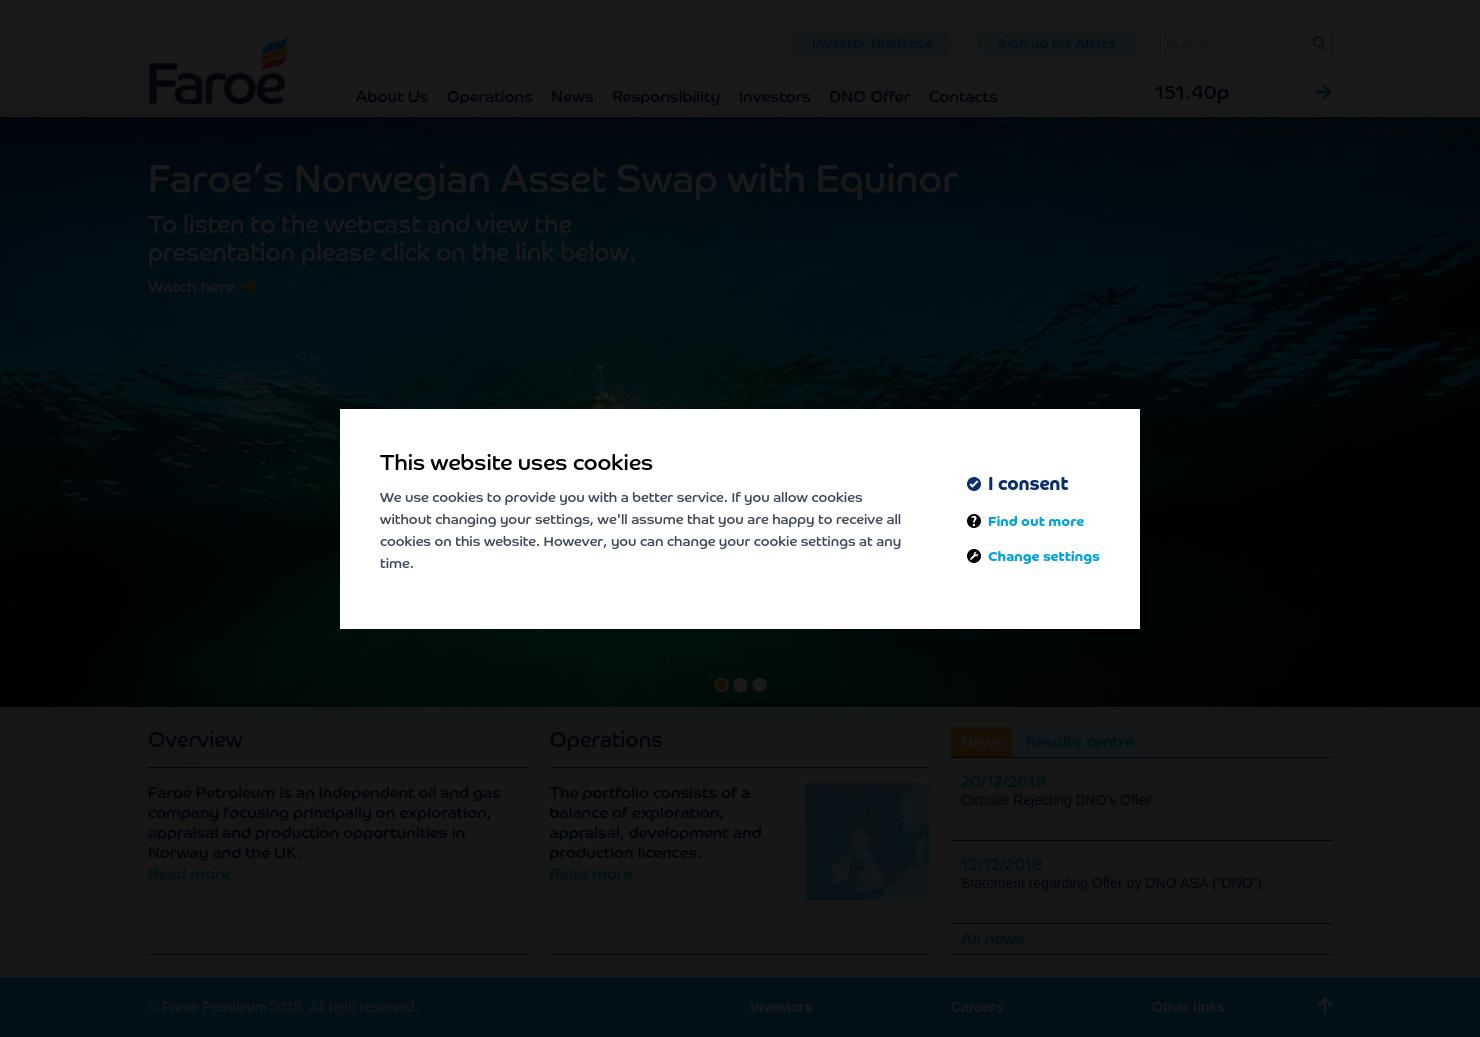 Faroe Petroleum Plc Home Page